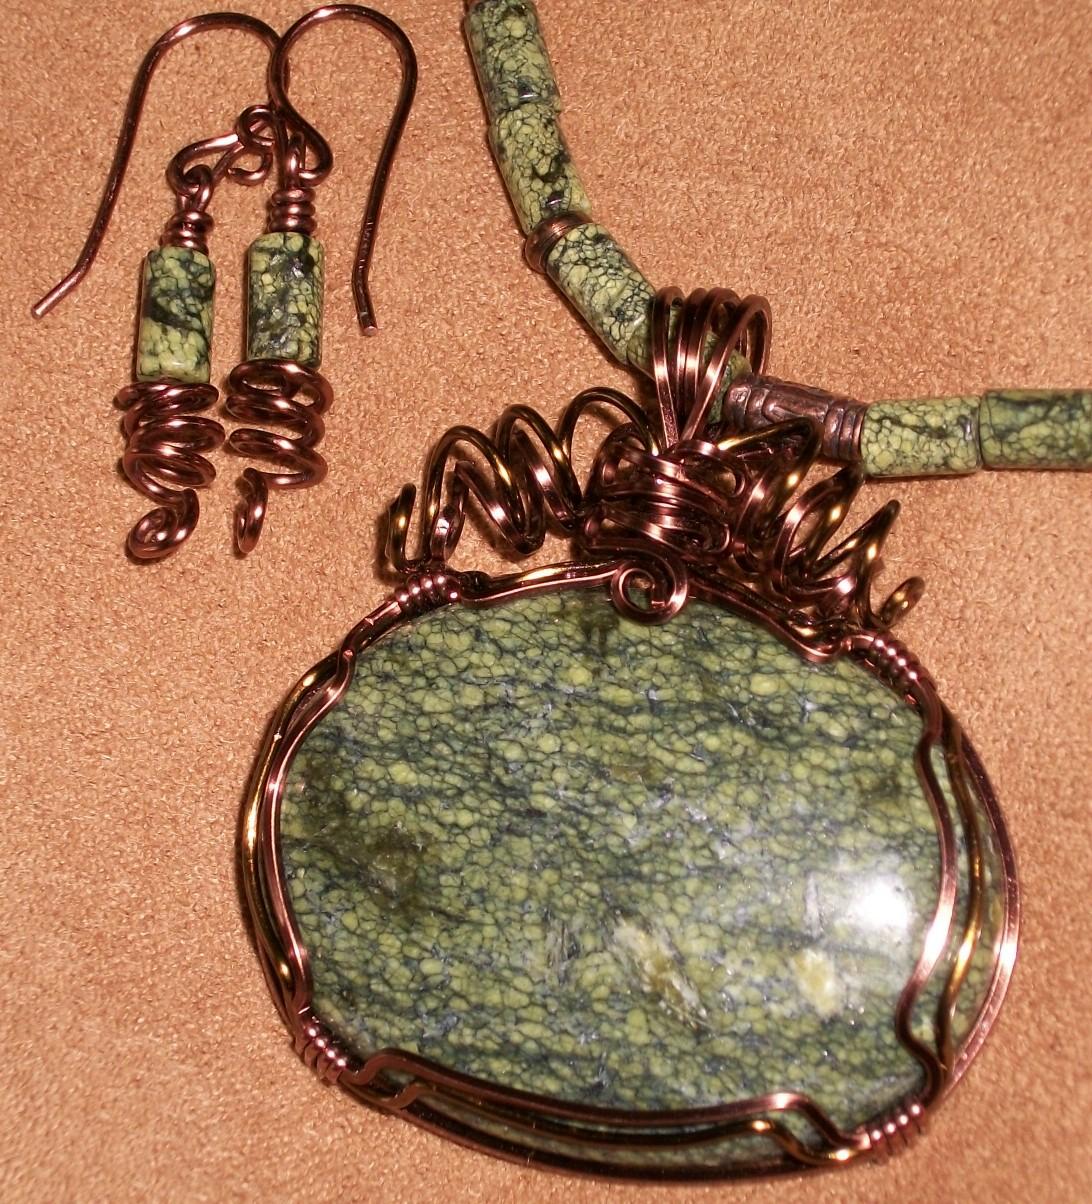 Shawnea Hardesty created this Serpentine jewelry set ...  Shawnea Hardest...